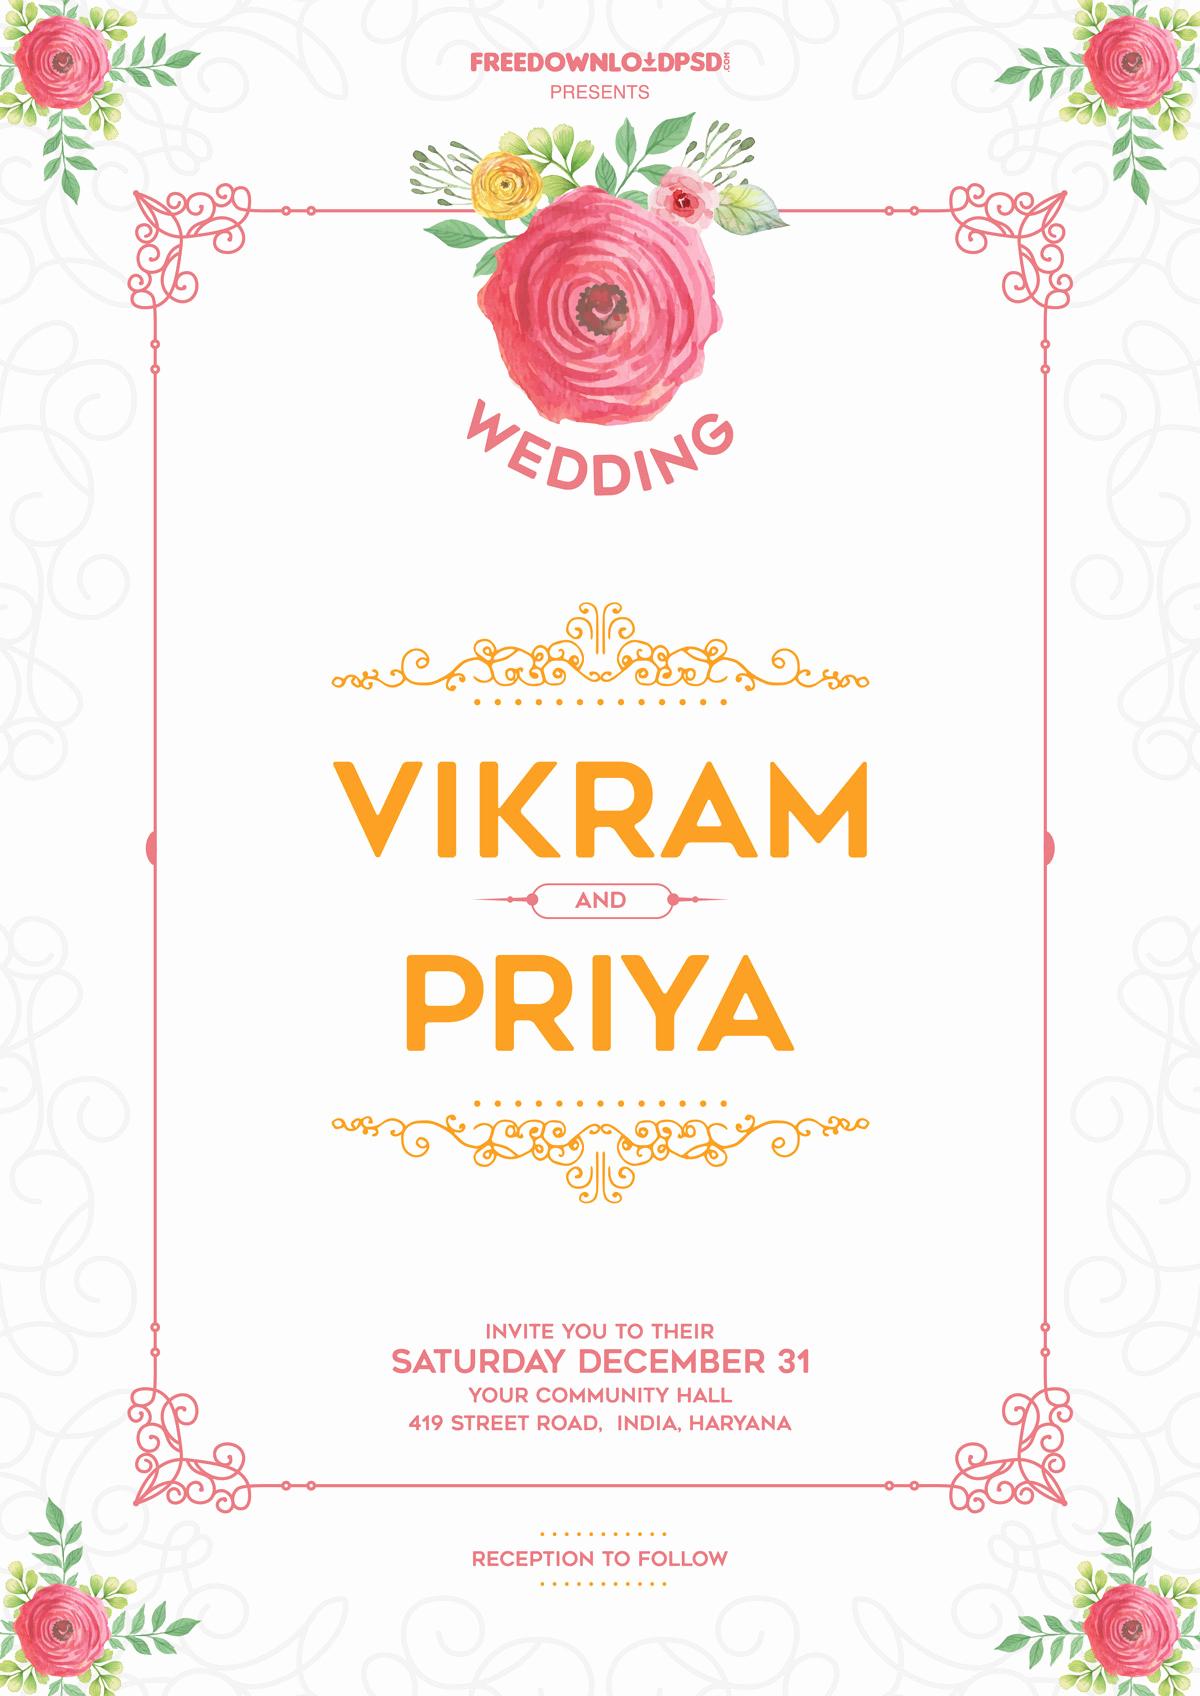 Wedding Invitation Templates Free Luxury 30 Elegant Wedding Invitation Psd Templates